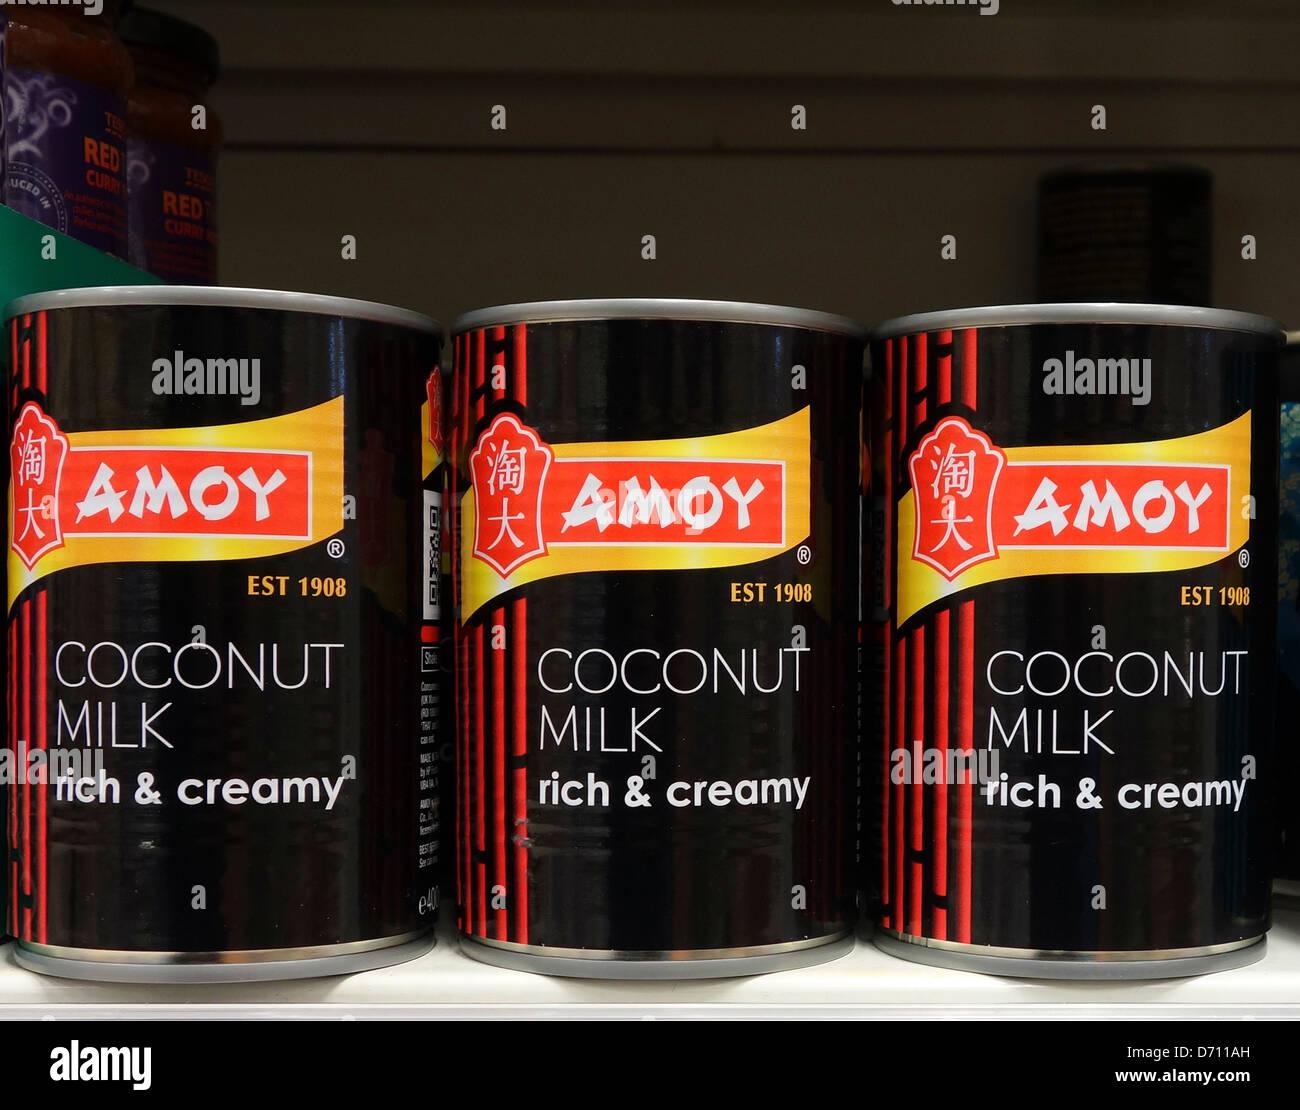 Tins of Amoy coconut milk - Stock Image